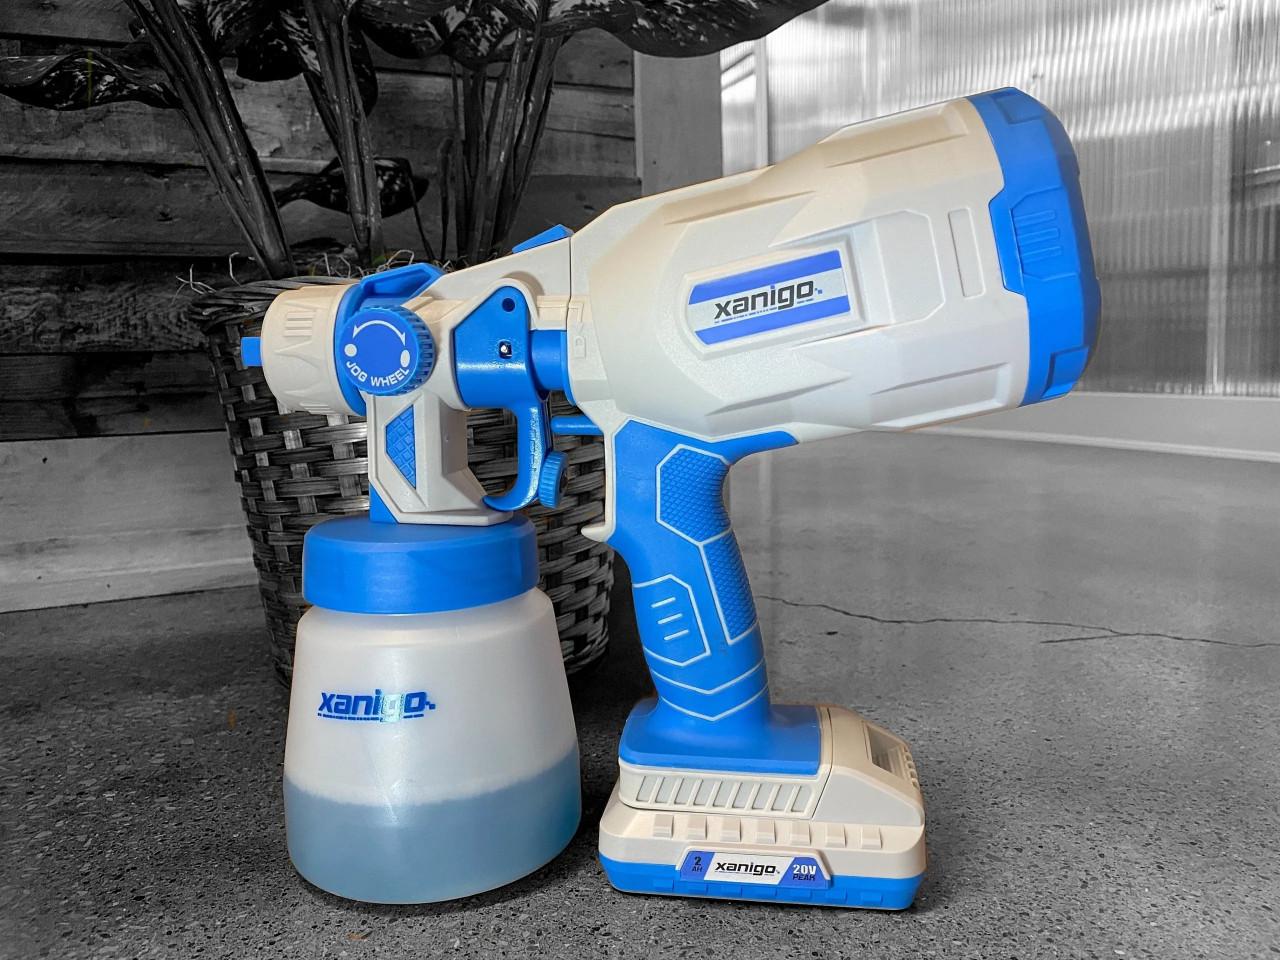 Xanigo Cordless Sprayer Bundle with Pure&Clean Sports Solution